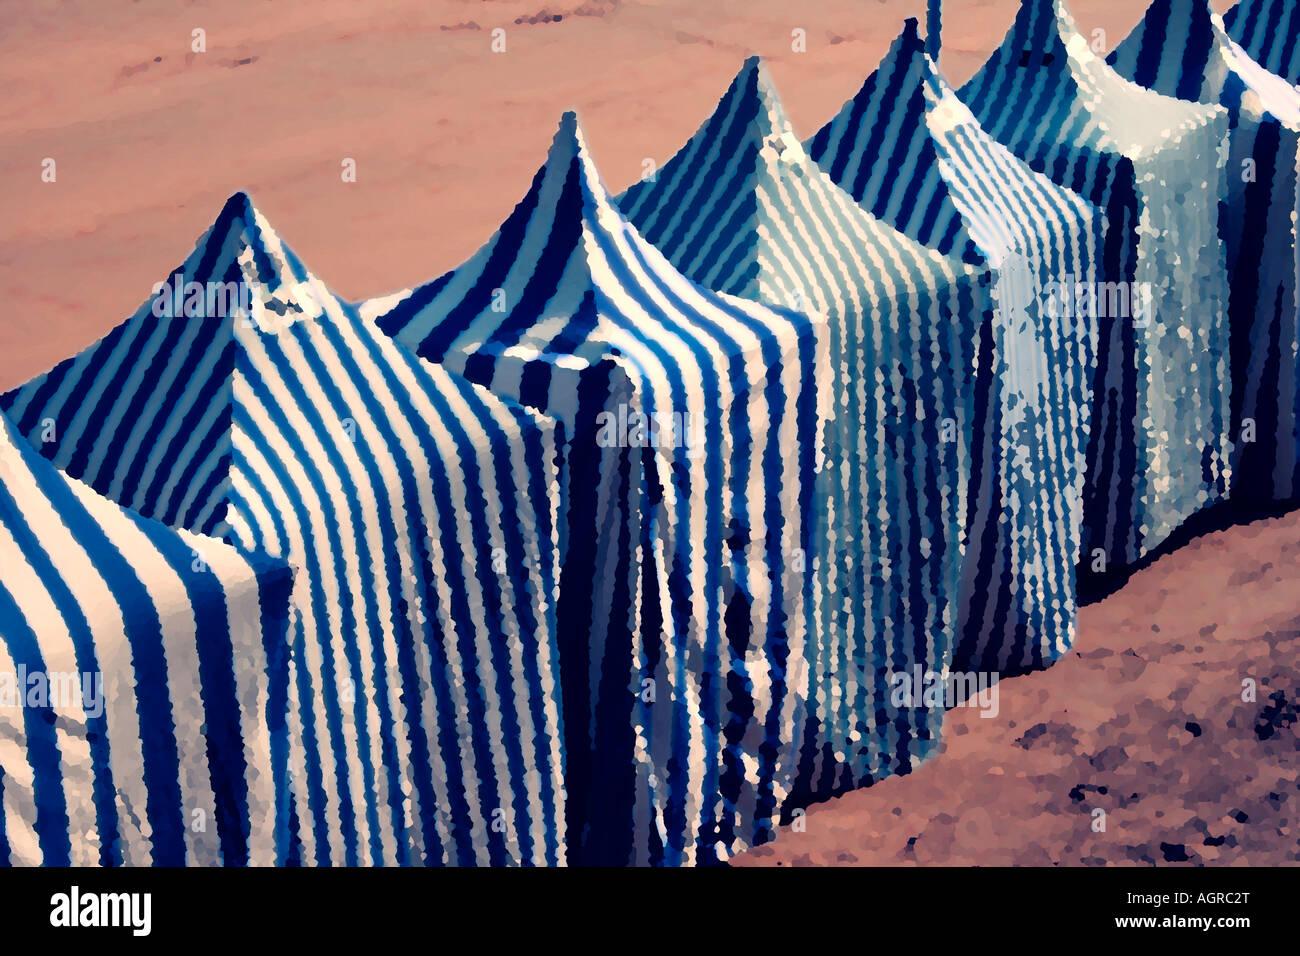 Stylised image of beach tents at Zarautz Spain - Stock Image